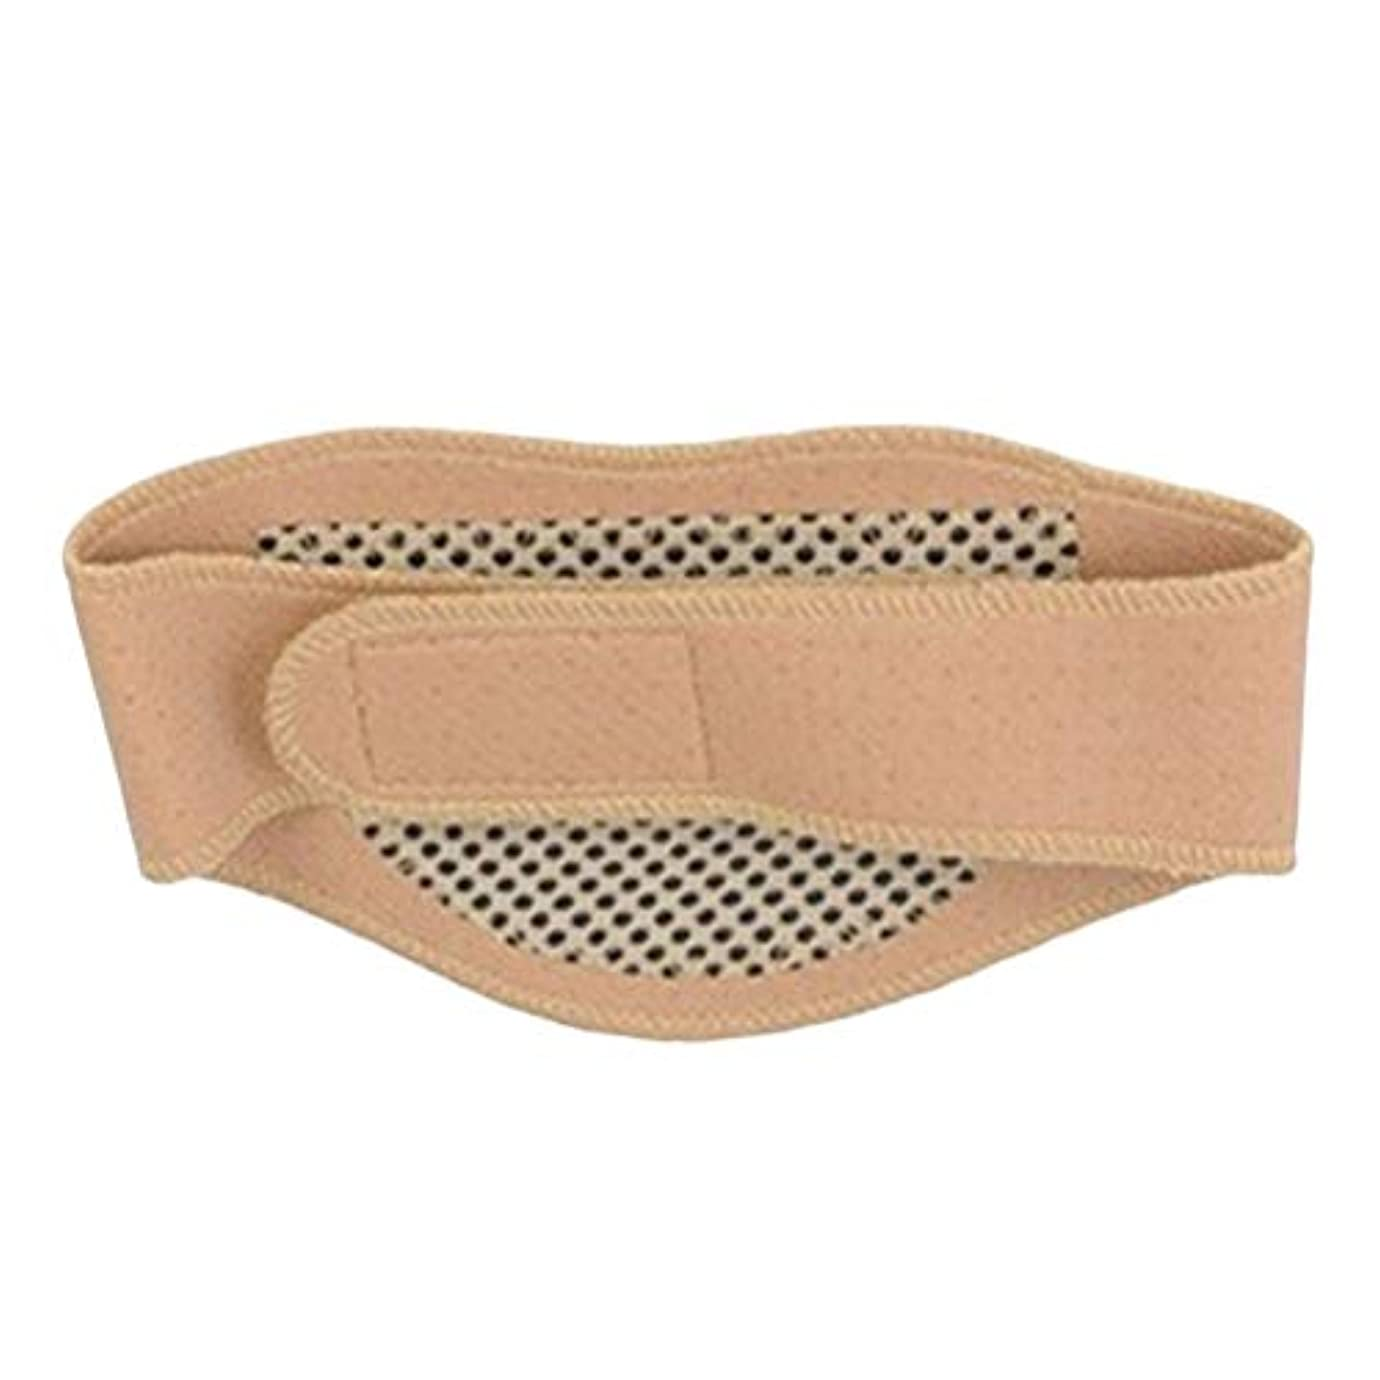 SUPVOX ネックバックストラップサポート自己保護頸椎自発暖房ガード磁気療法ネックブレース